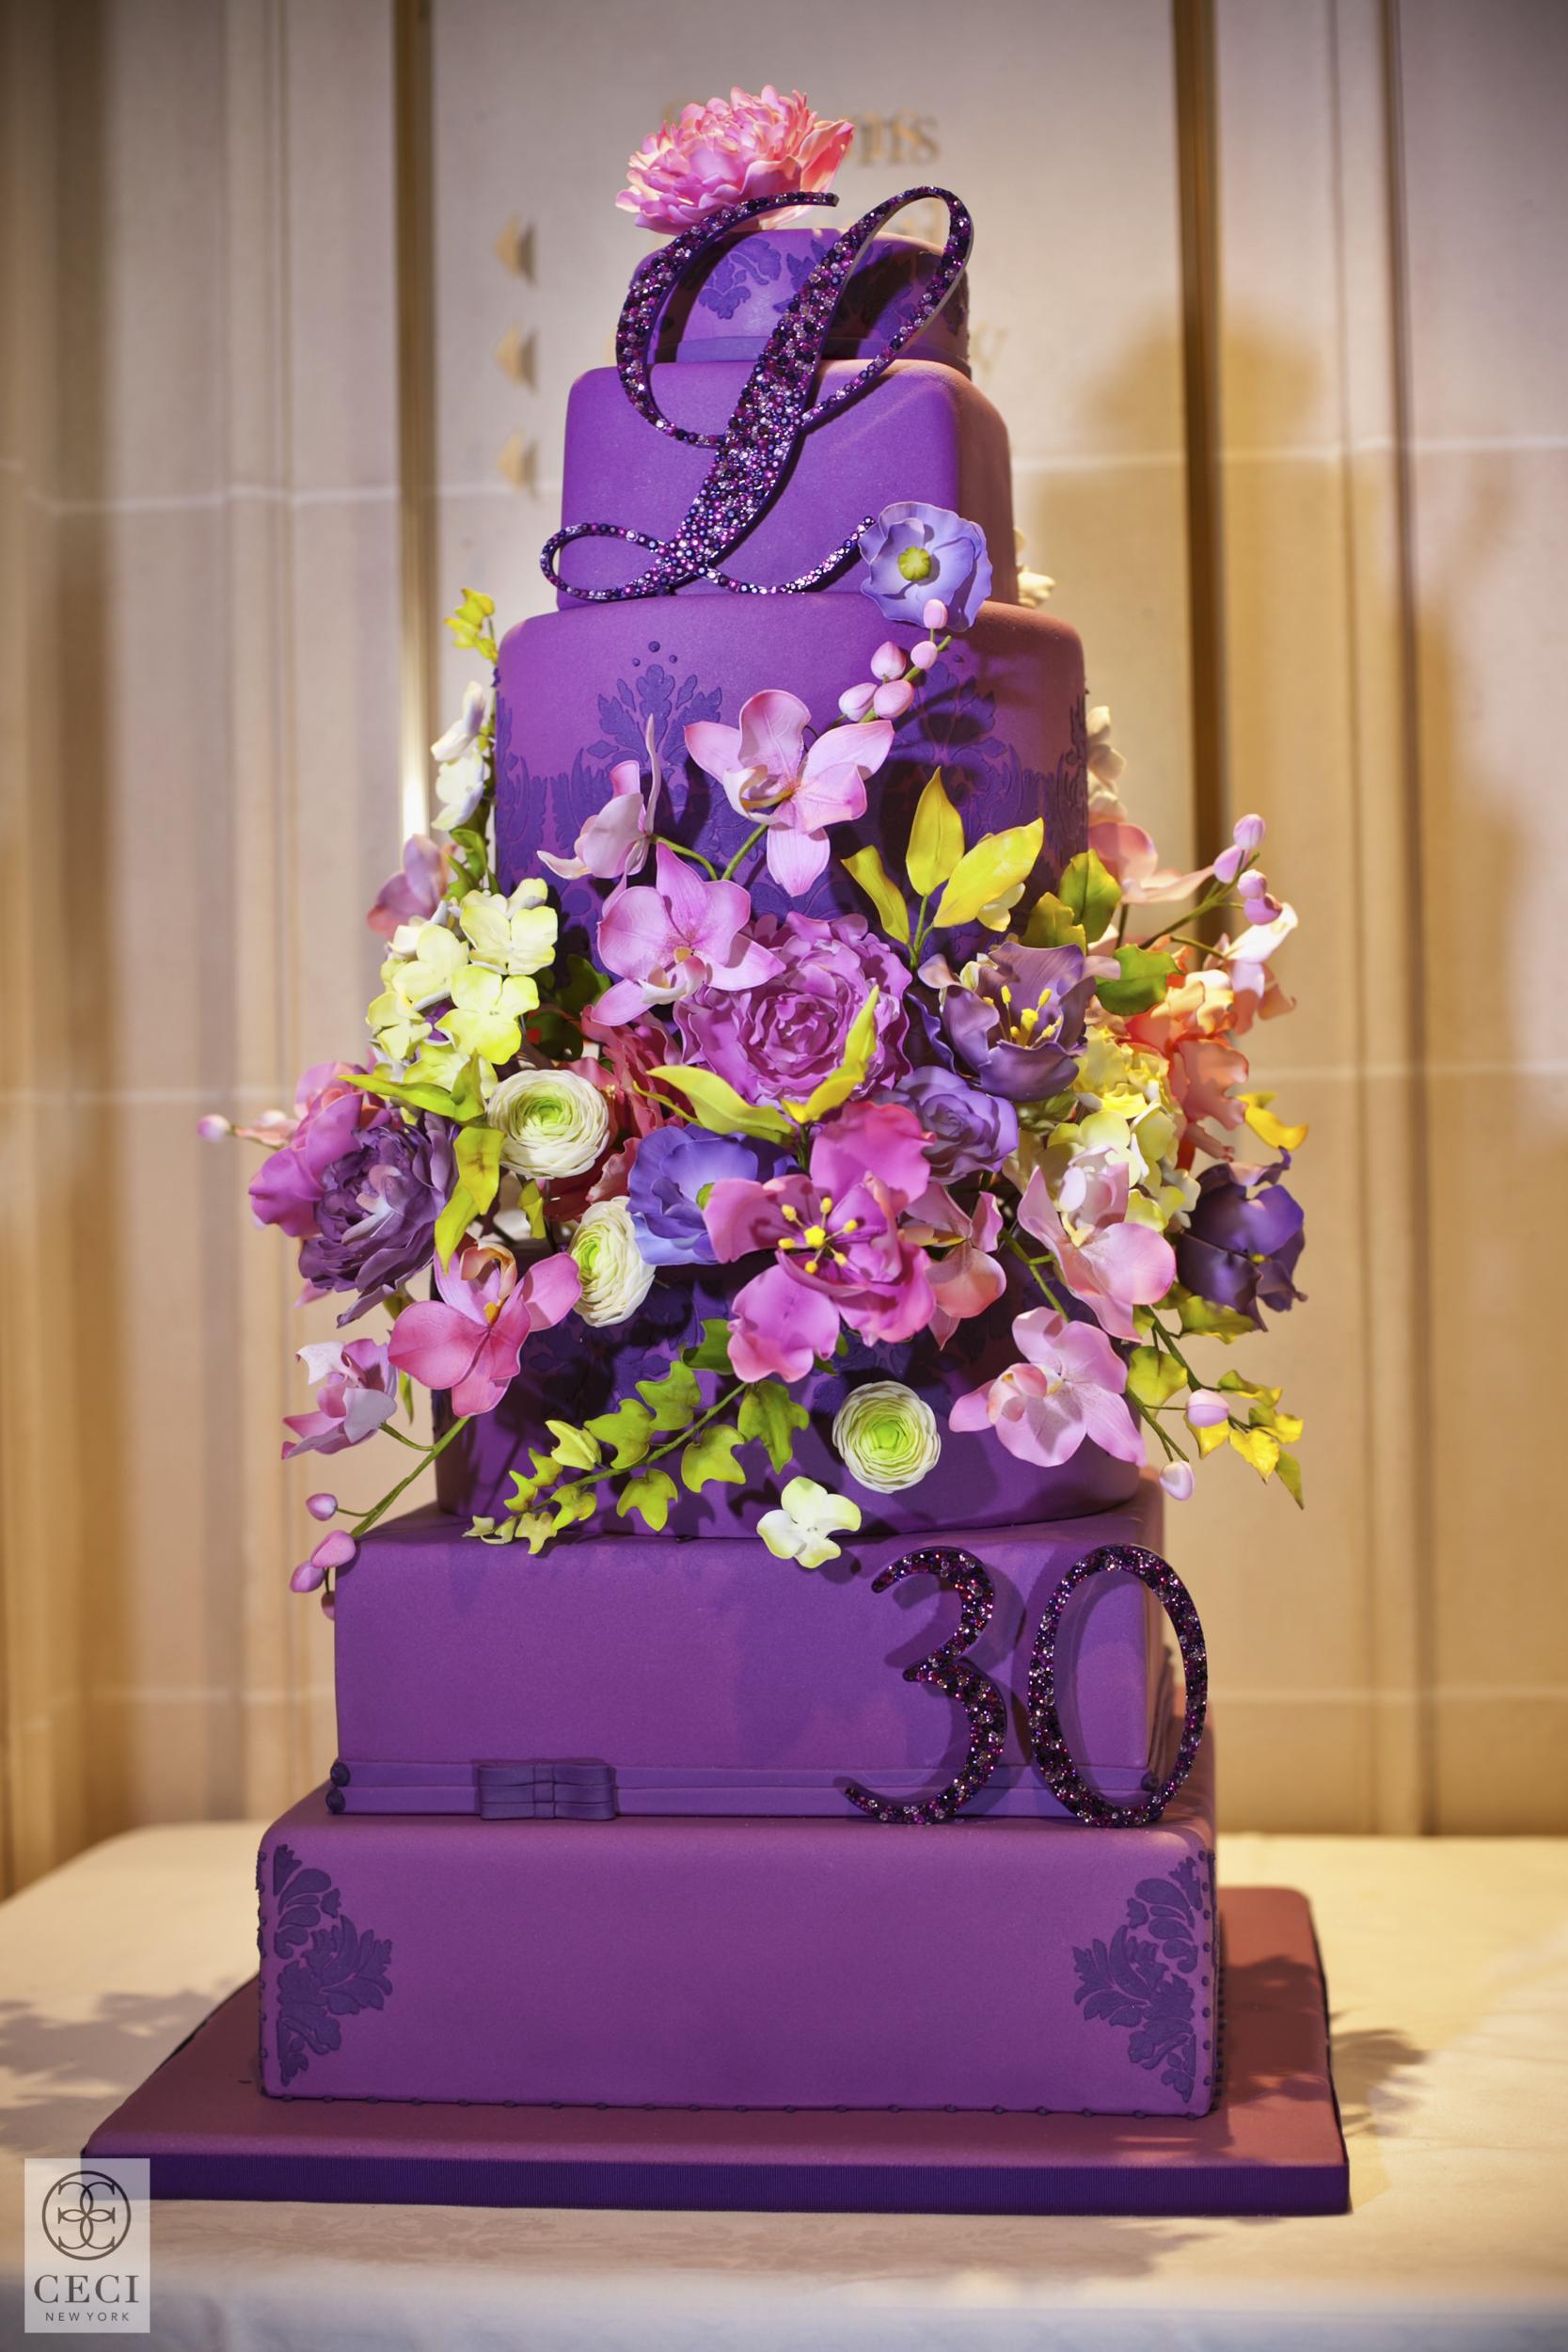 ceci_new_york_lucas_somoza_purple_regal_wediding_birthday_commitment_ceremony_gold-34.jpg